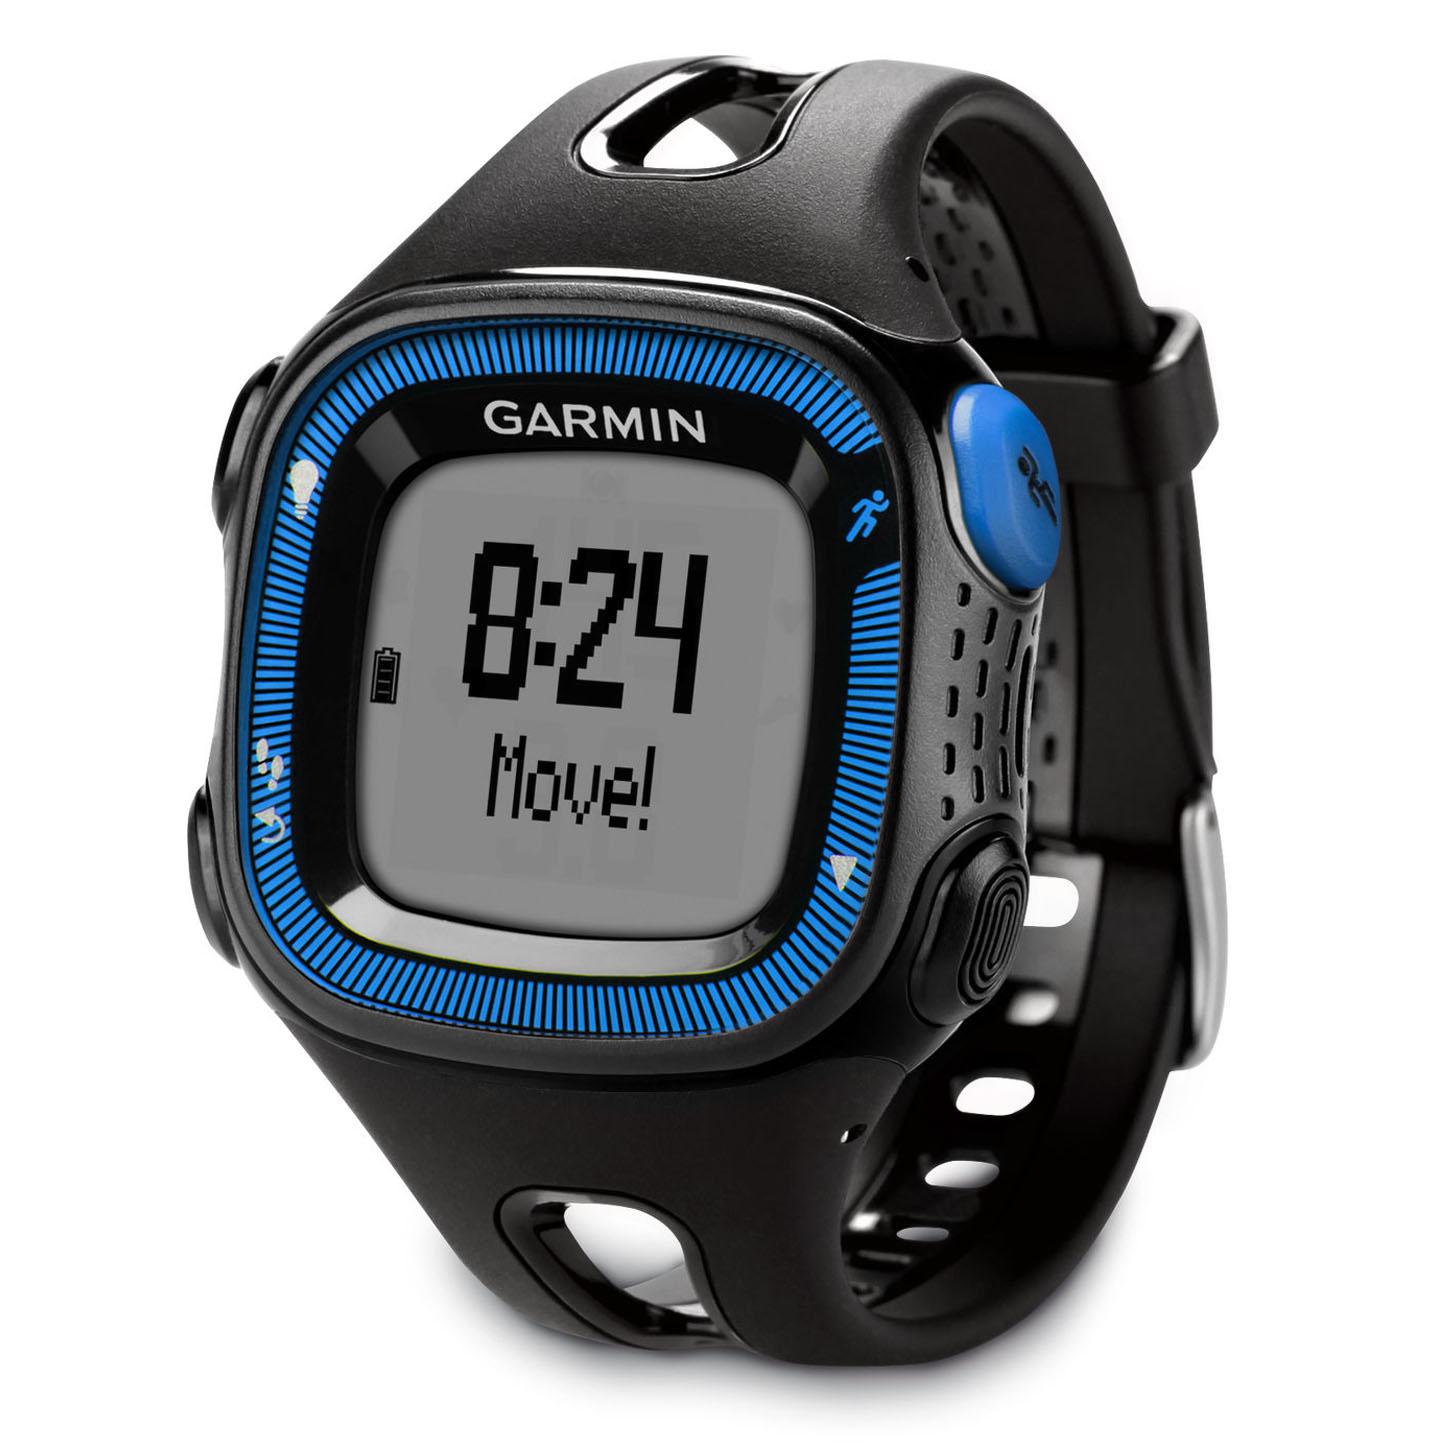 Garmin Forerunner 15 Large GPS Running Watch - Black